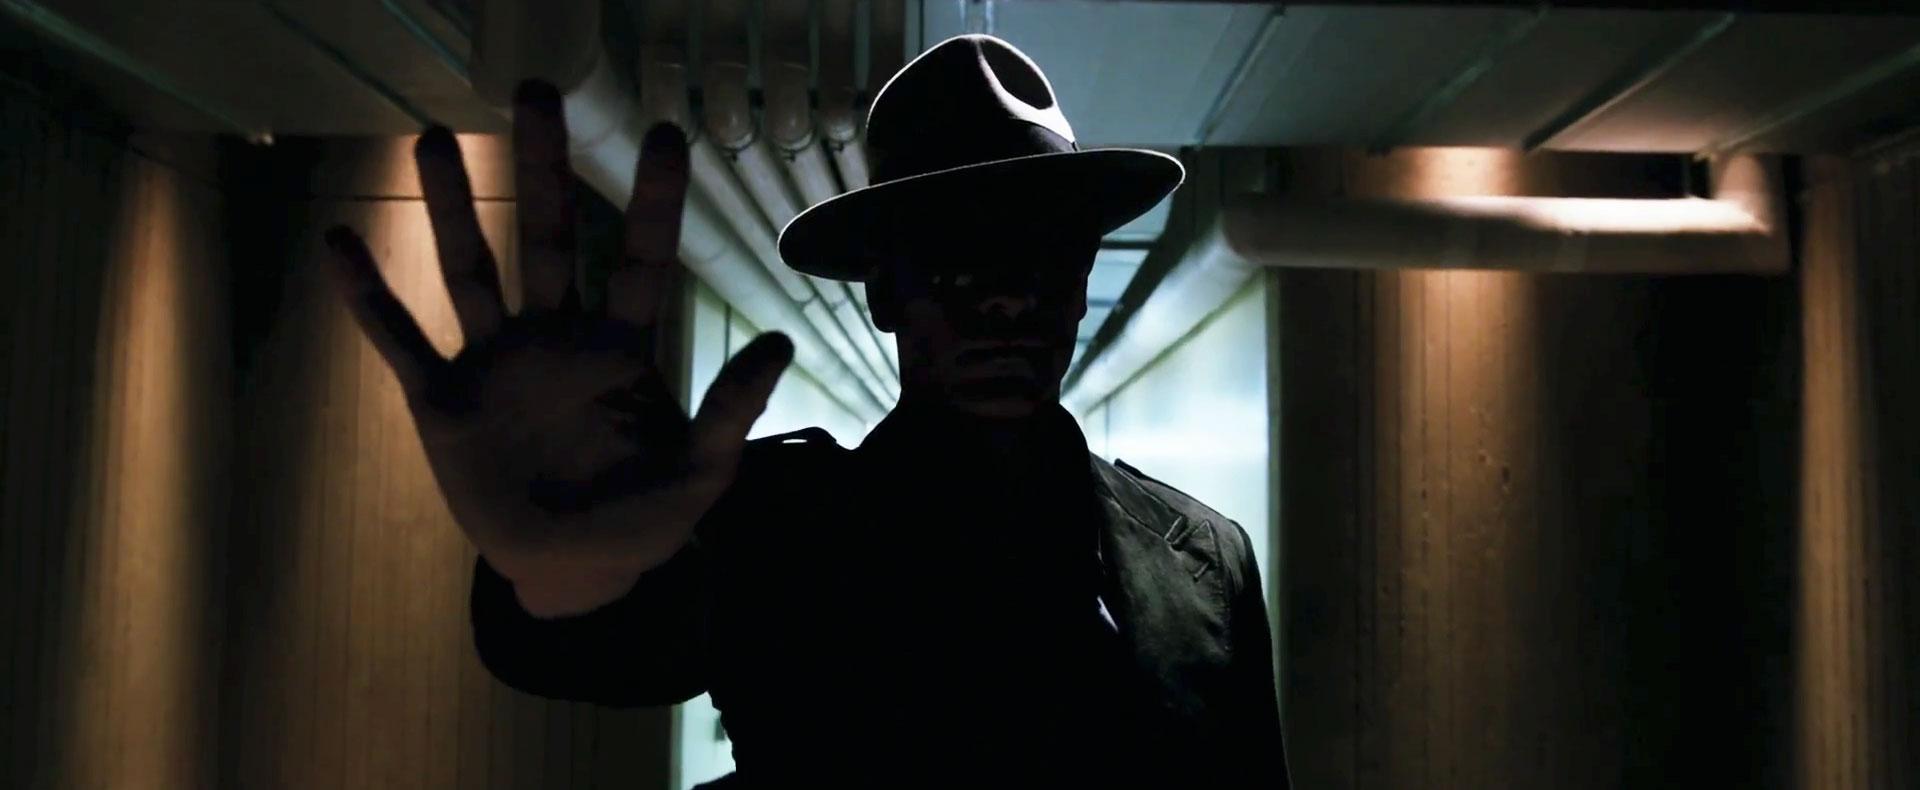 X Men Days Of Future Past Magneto Helmet | www.imgkid.com ...